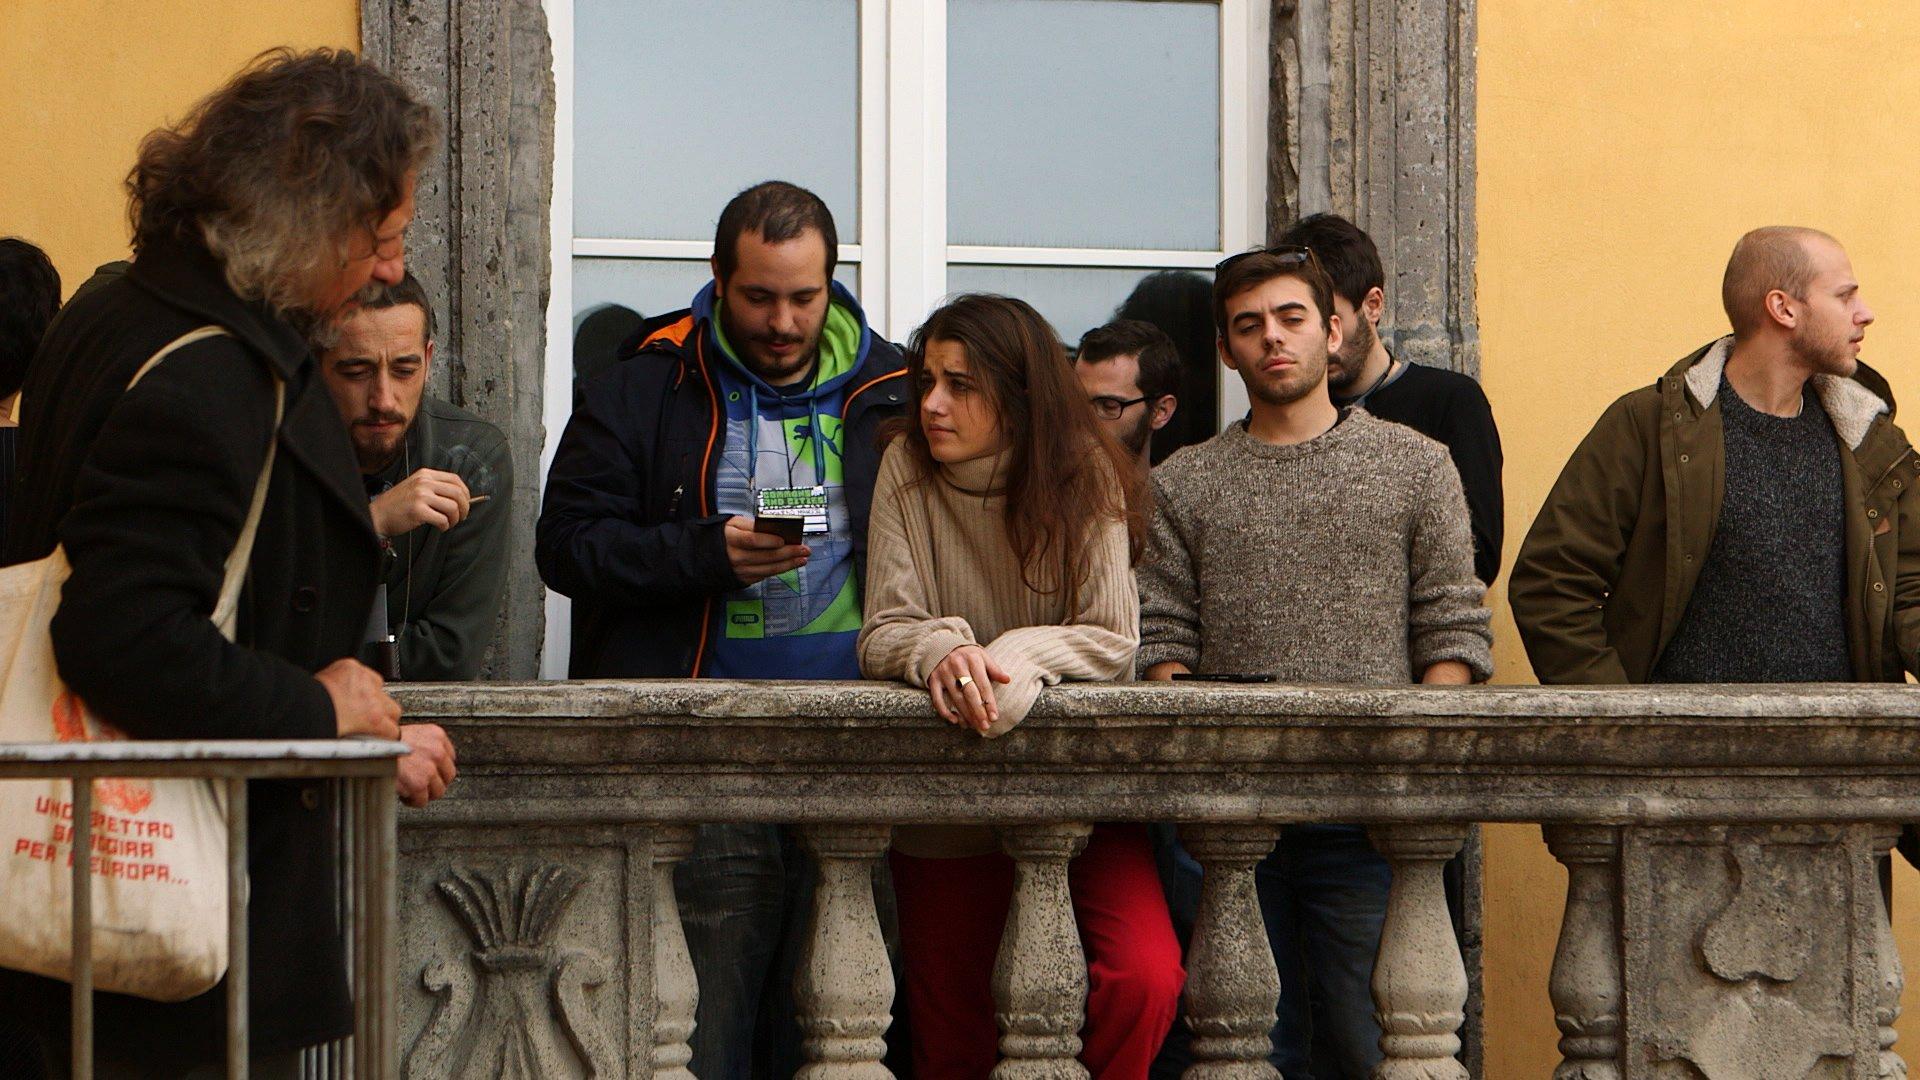 Italiens verlorene Jugend – Auswandern als Chance